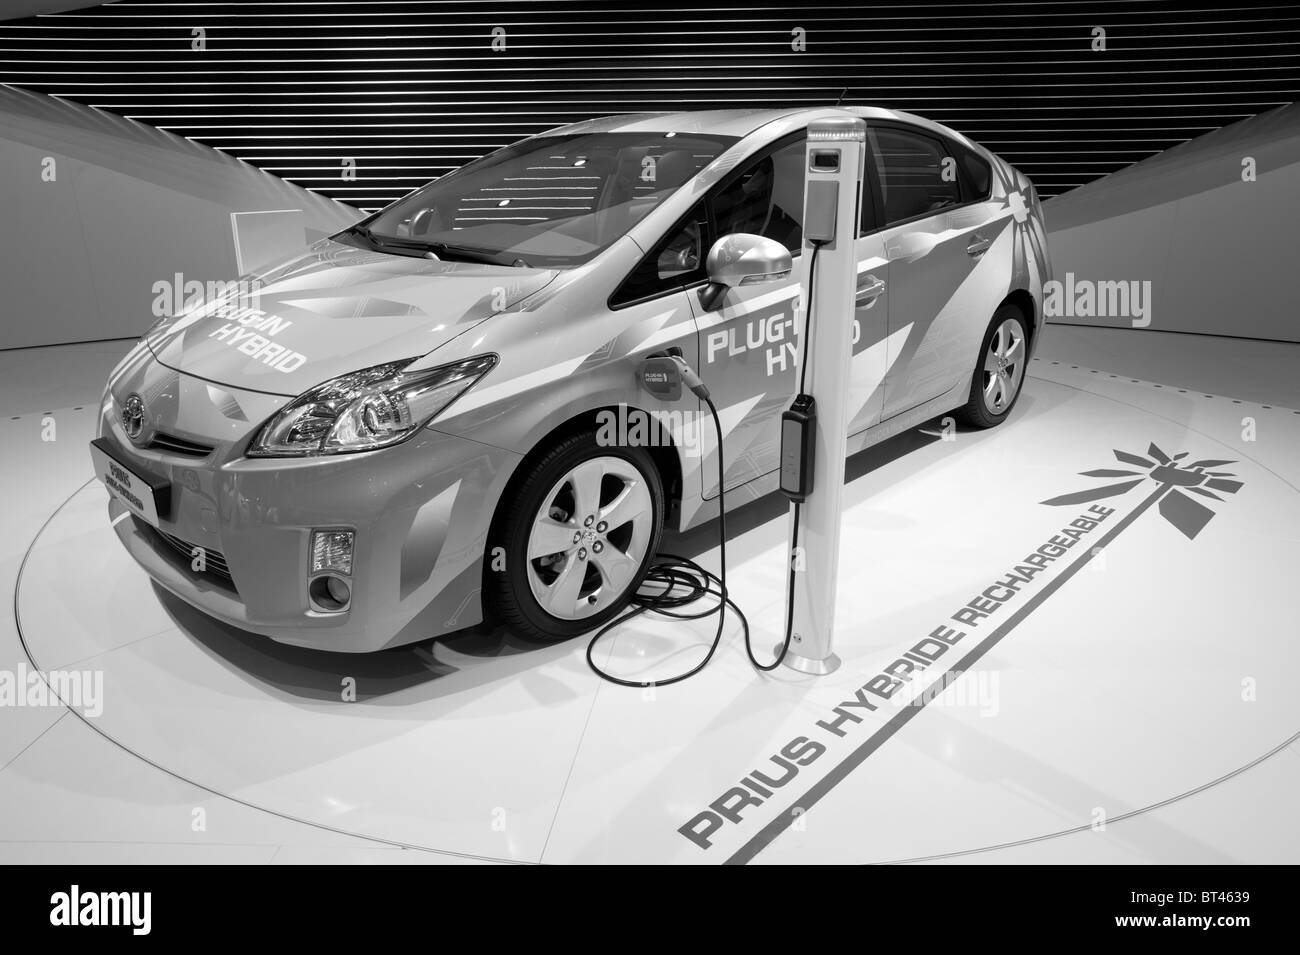 Toyota Prius plugin hybrid car at Paris Motor Show 2010 - Stock Image